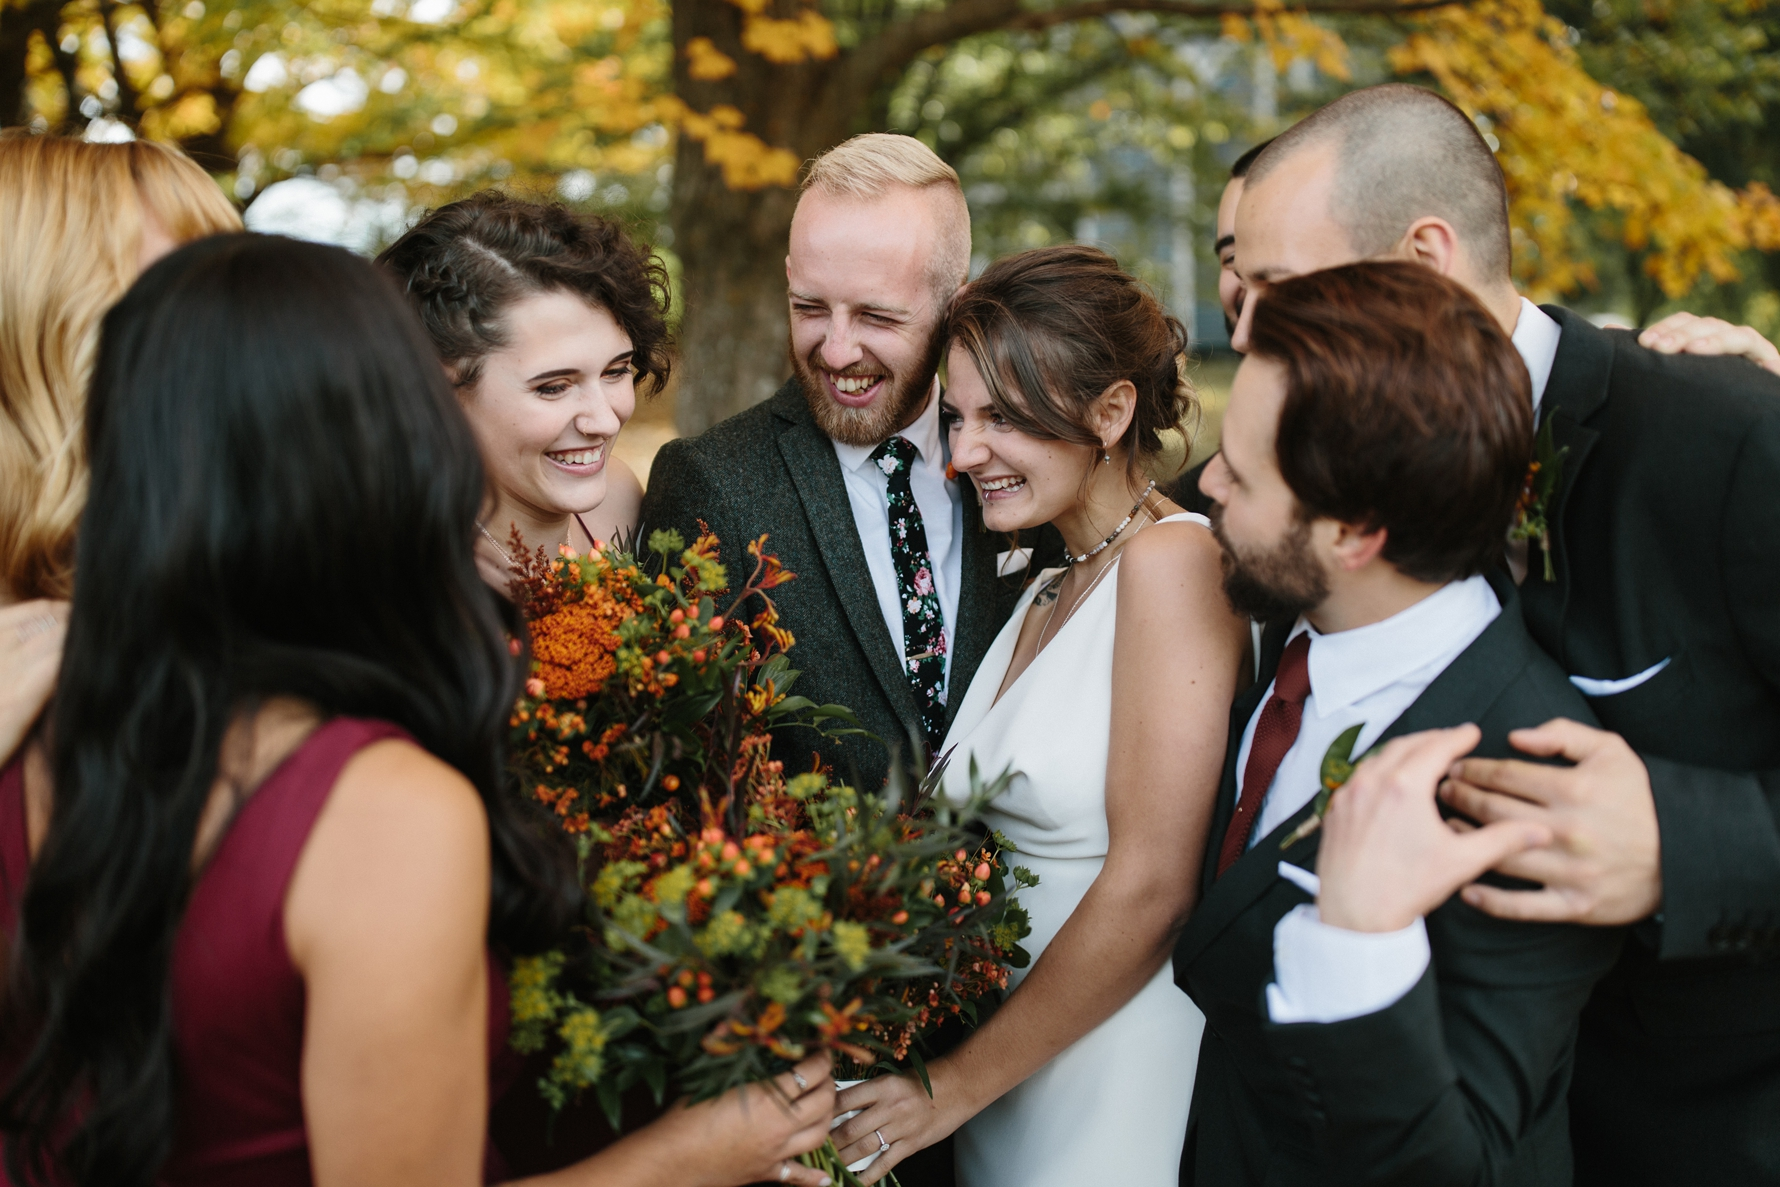 norris-traverse-city-wedding-25.JPG